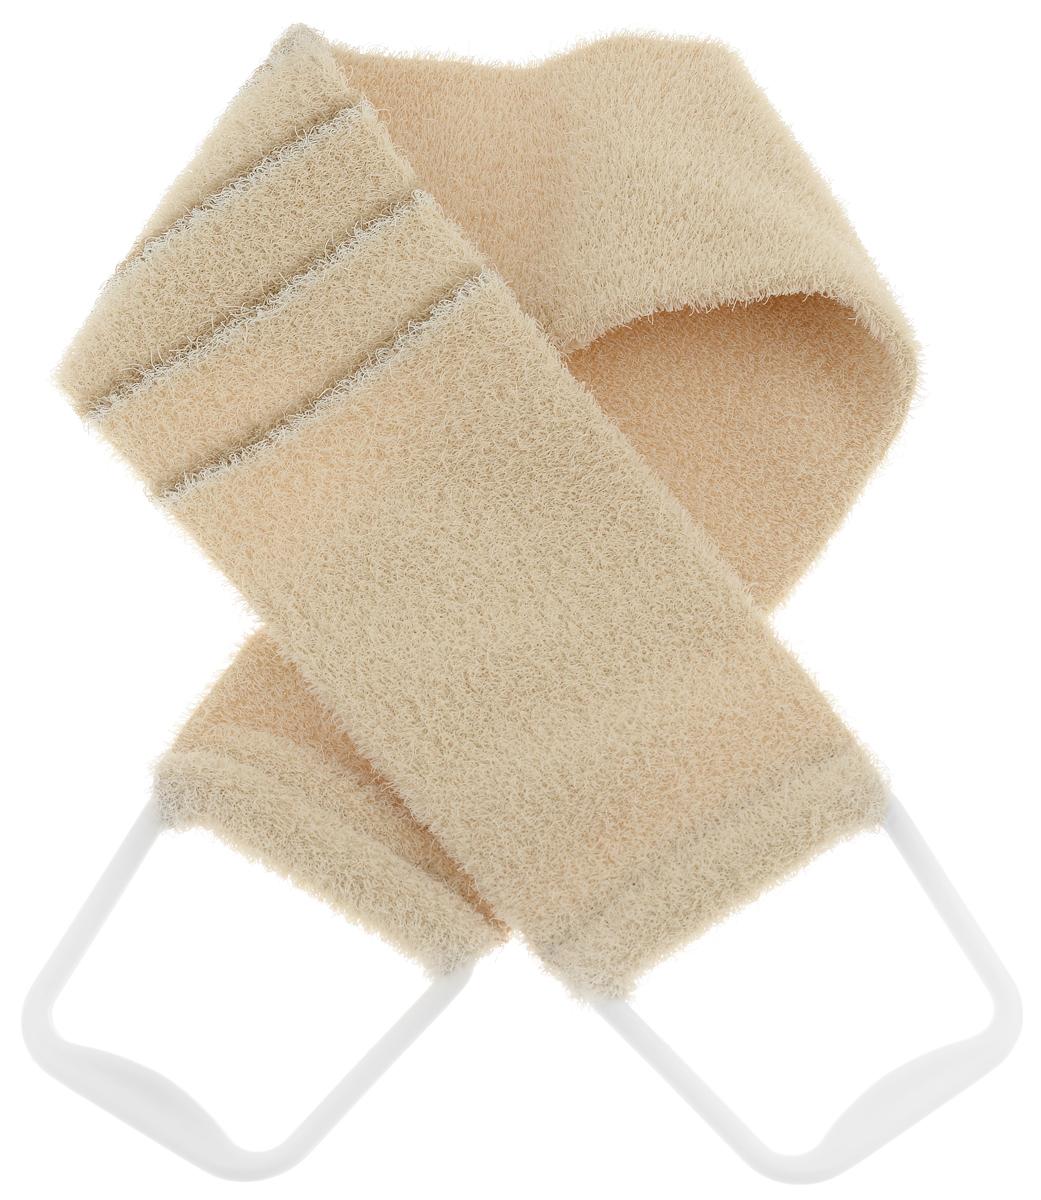 Riffi Мочалка-пояс, массажная, жесткая, цвет: бежевый. 824